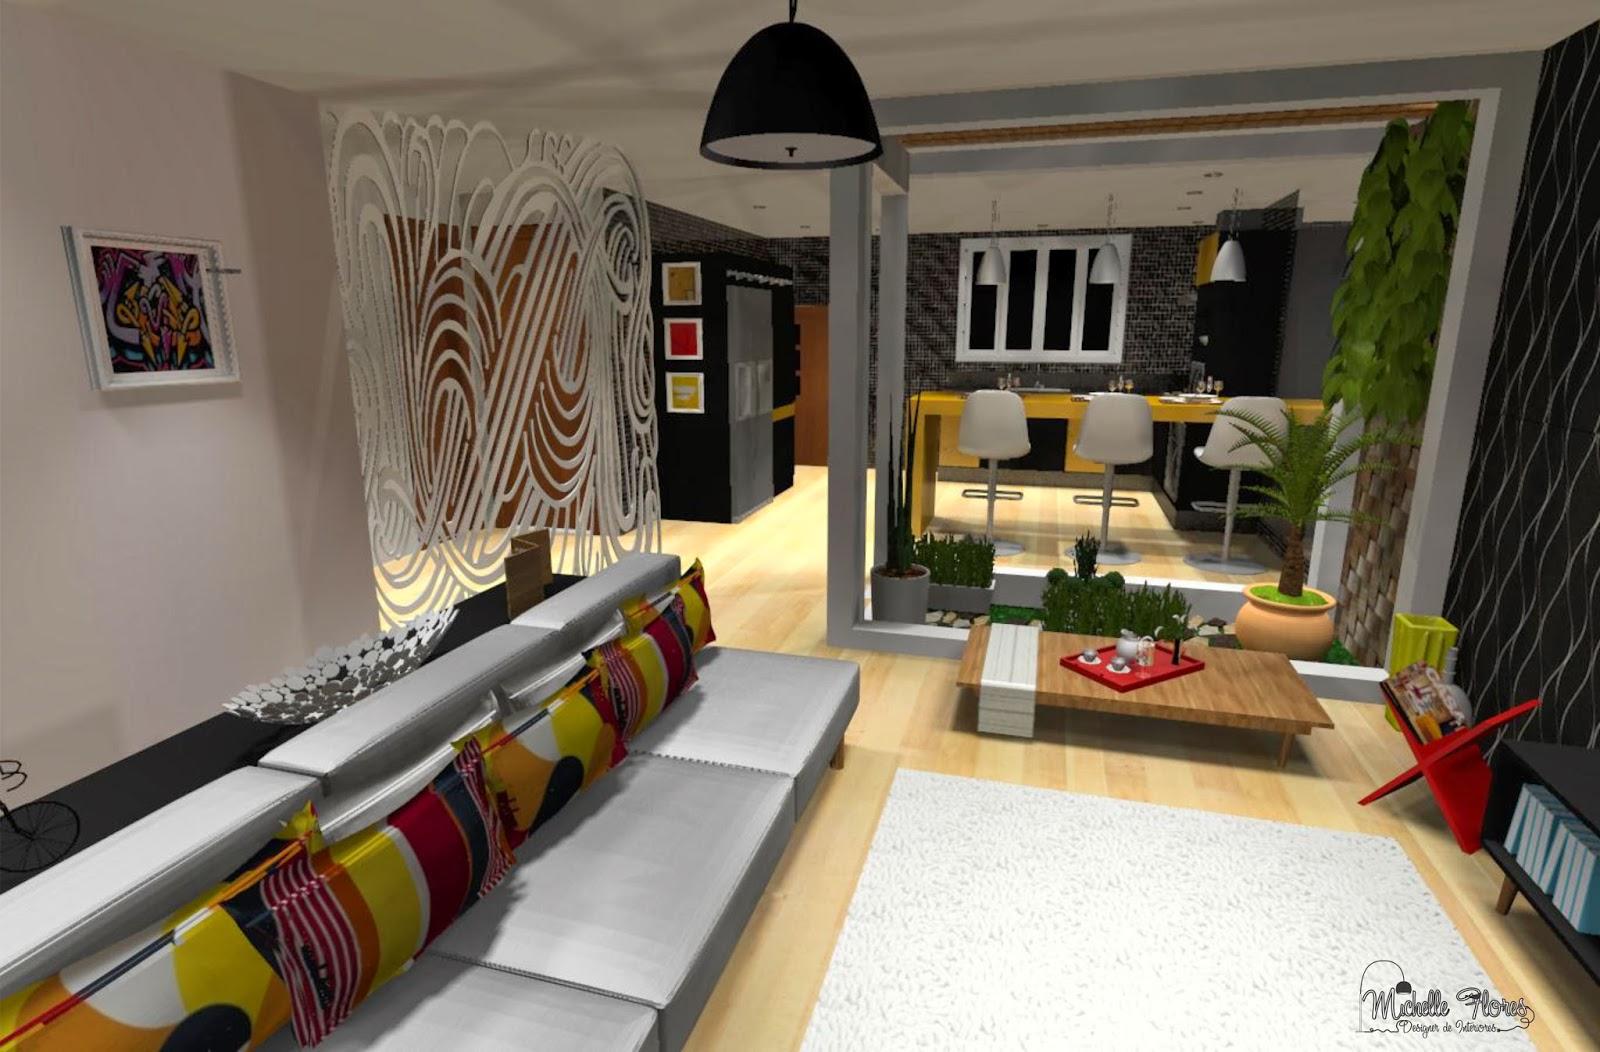 Divisor De Ambientes Para Sala Url Dscxjpg Separador De Ambientes  -> Divisor Sala E Cozinha